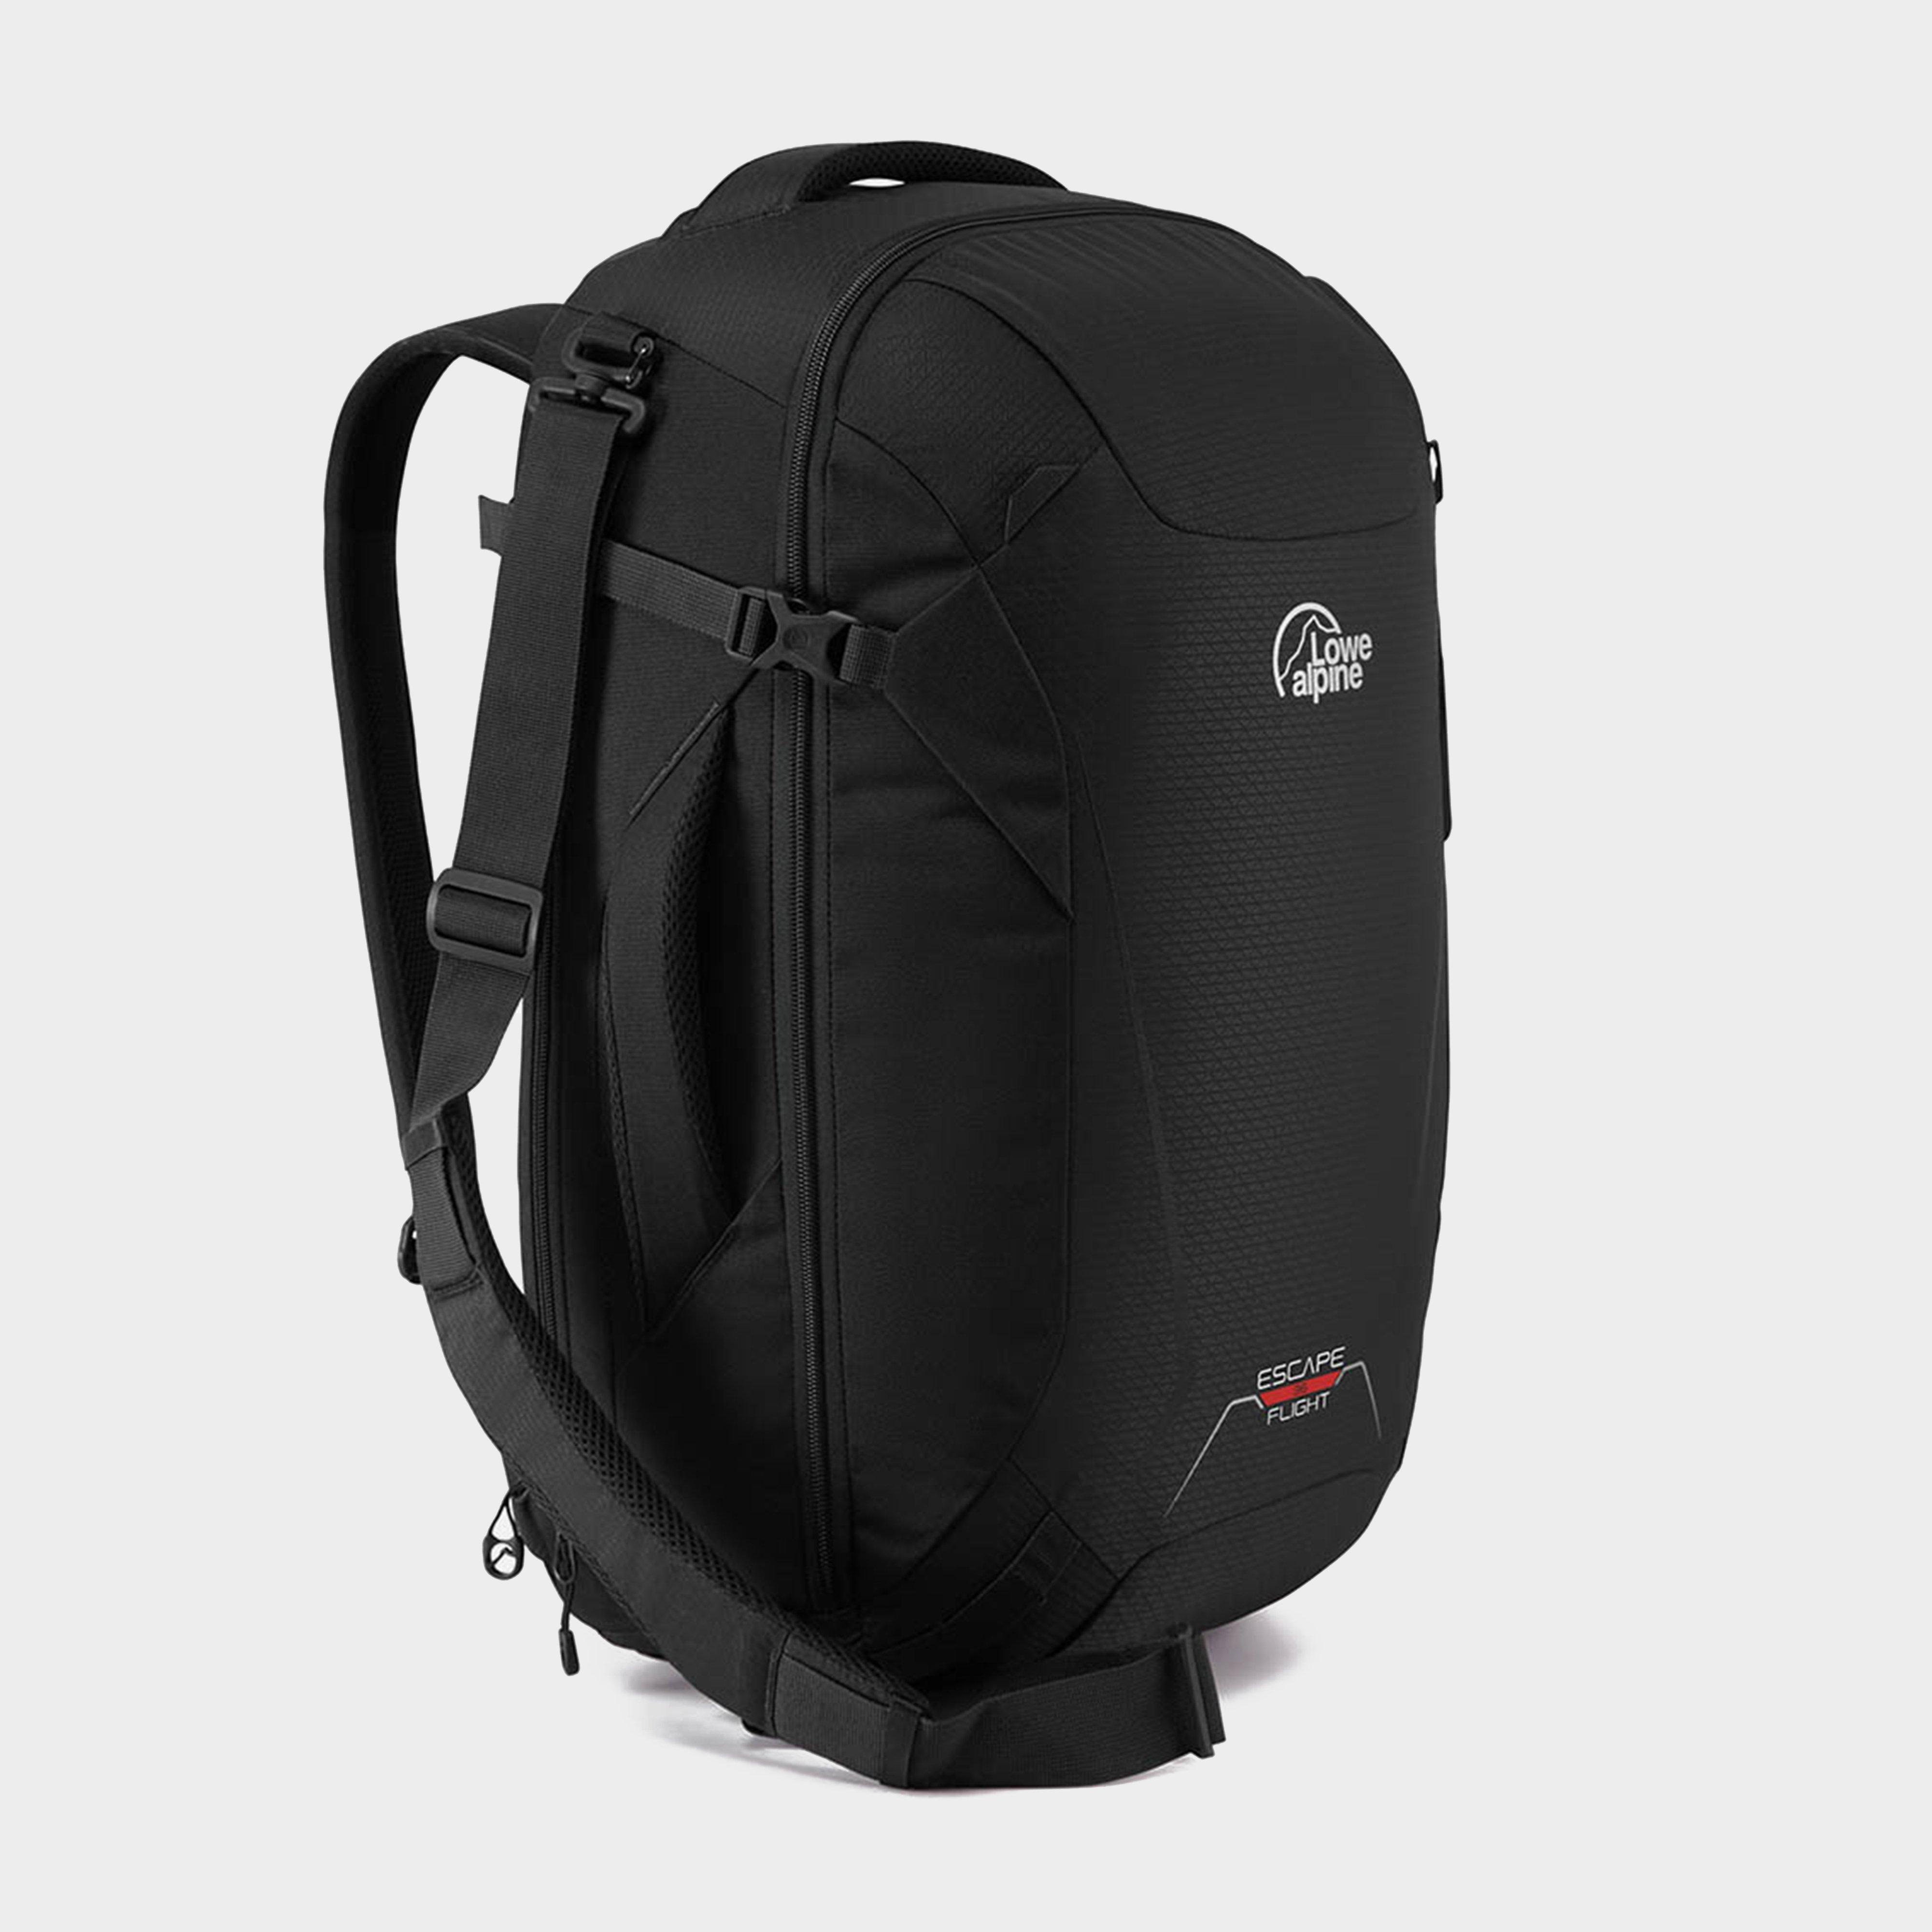 Lowe Alpine Escape Flight 36L Backpack - Black, Black